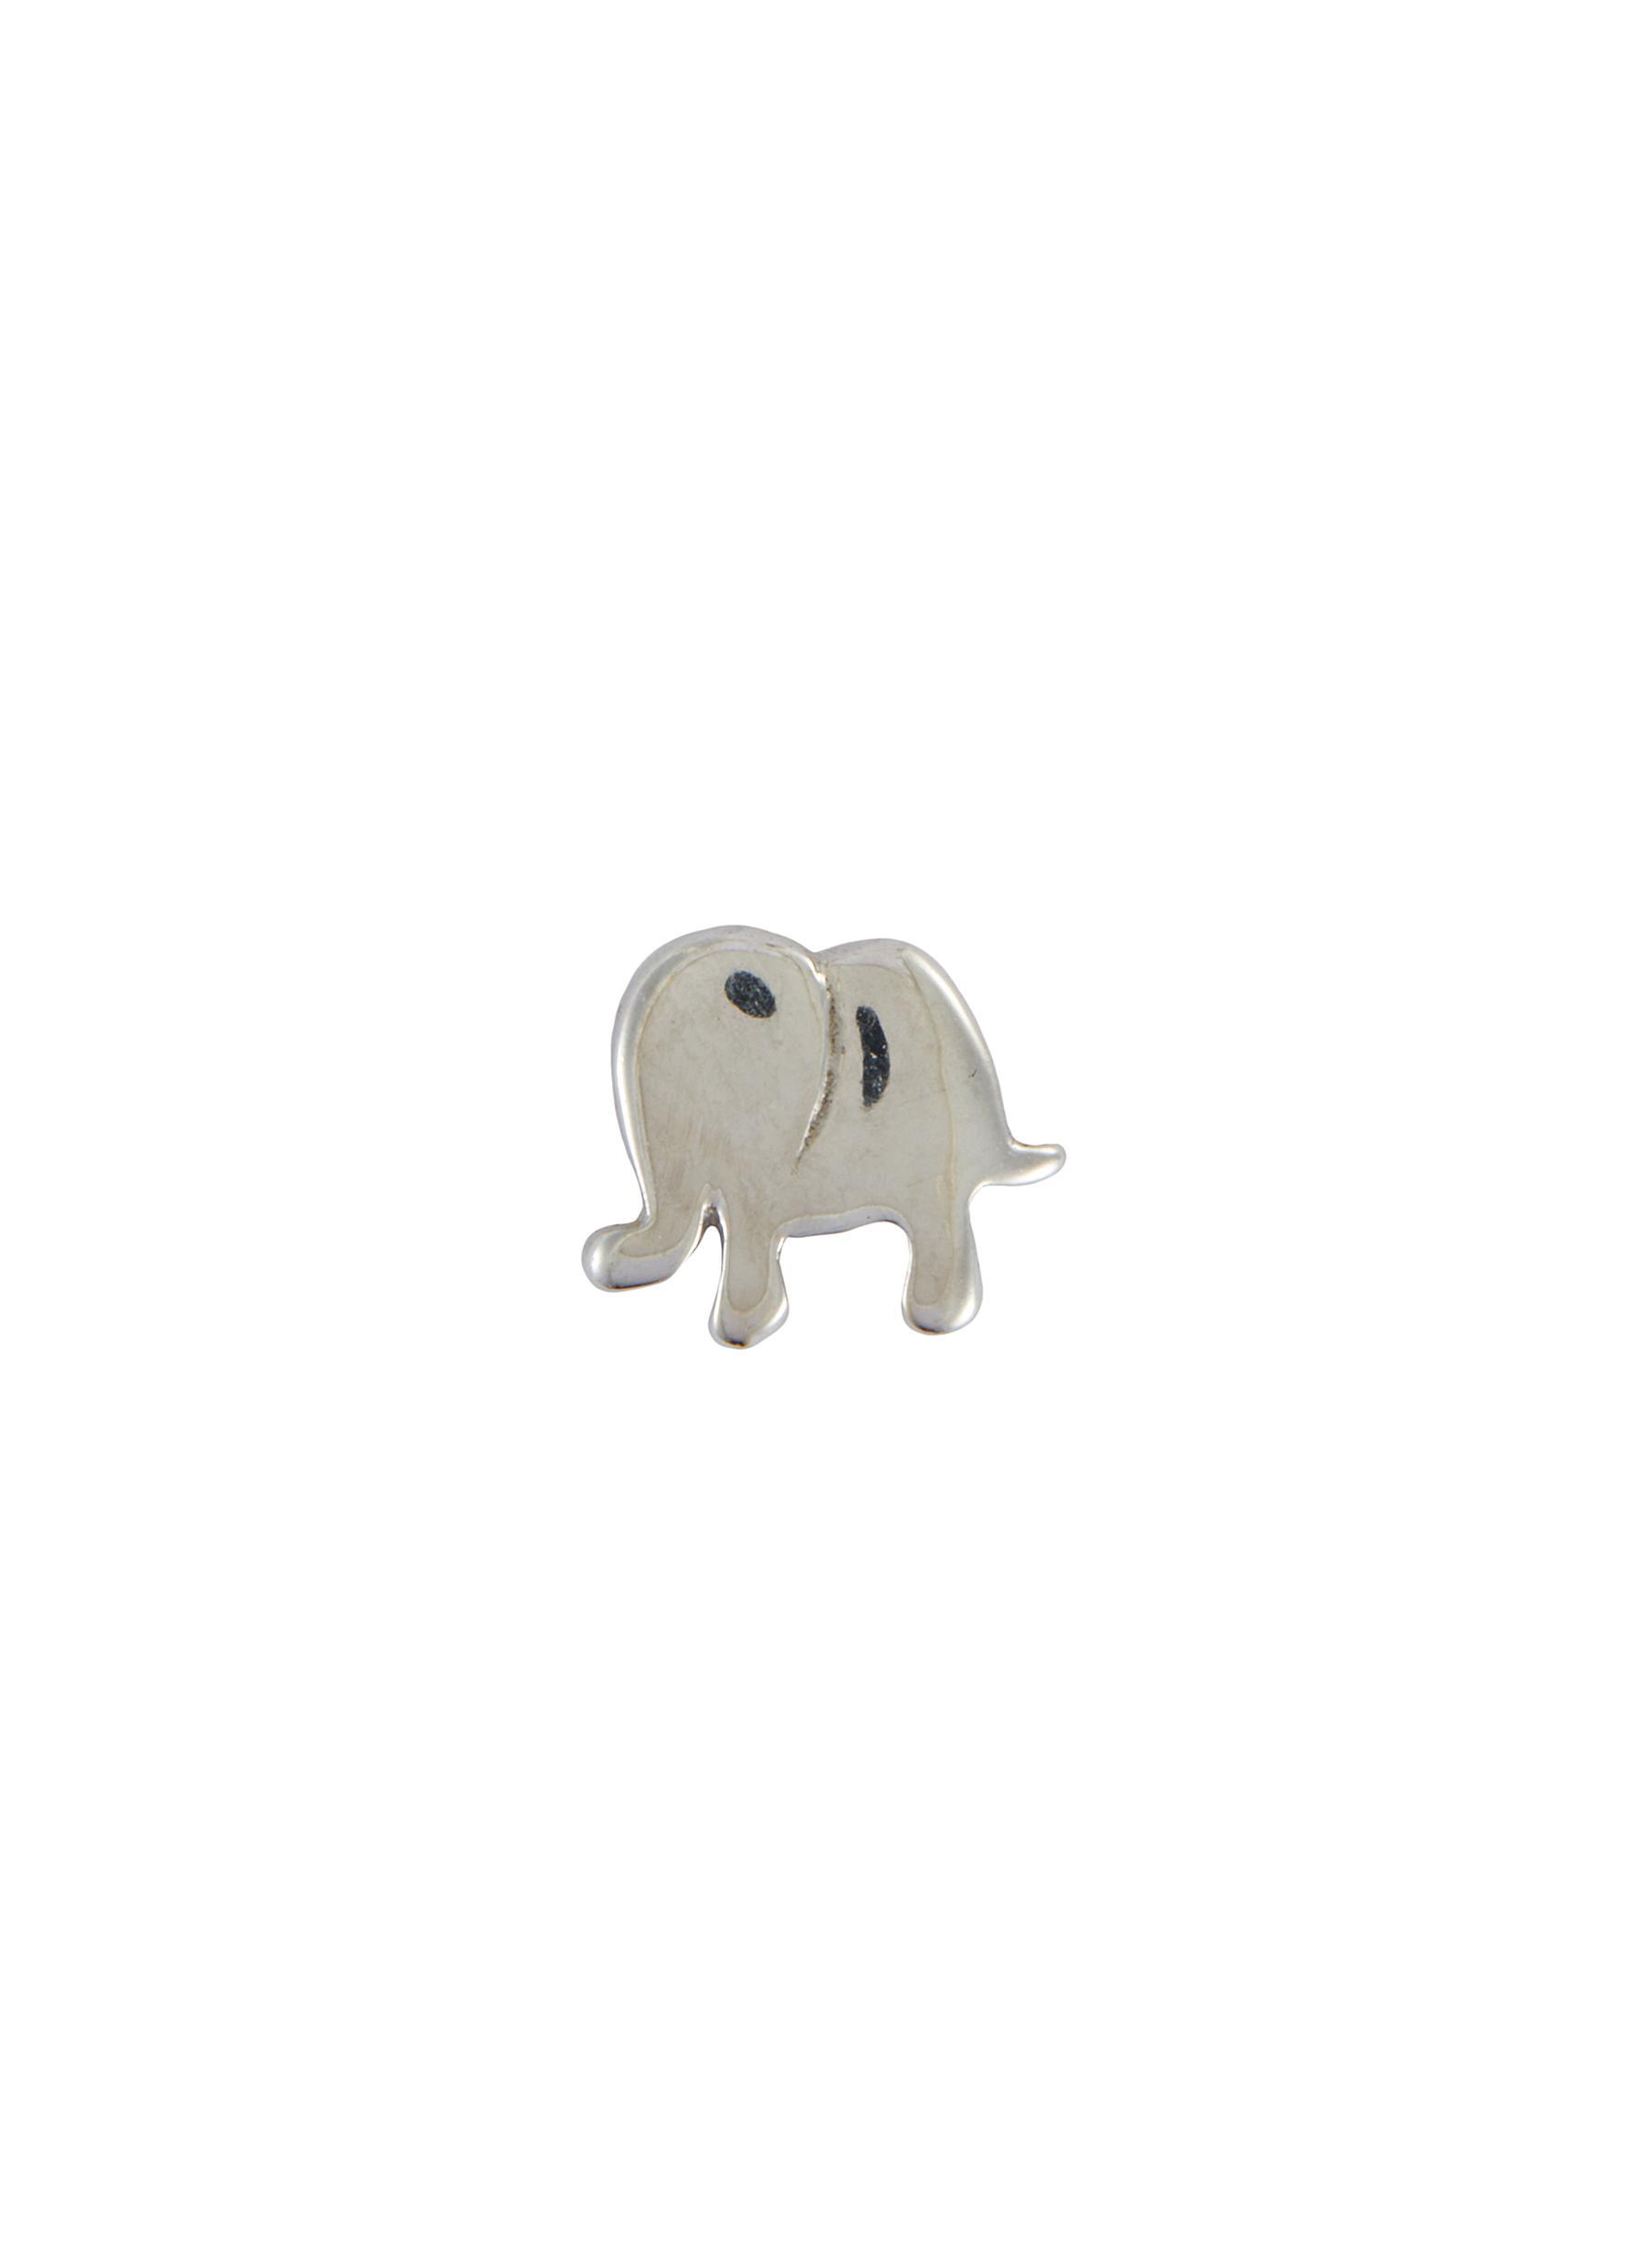 'Elephant' 18k White Gold Charm